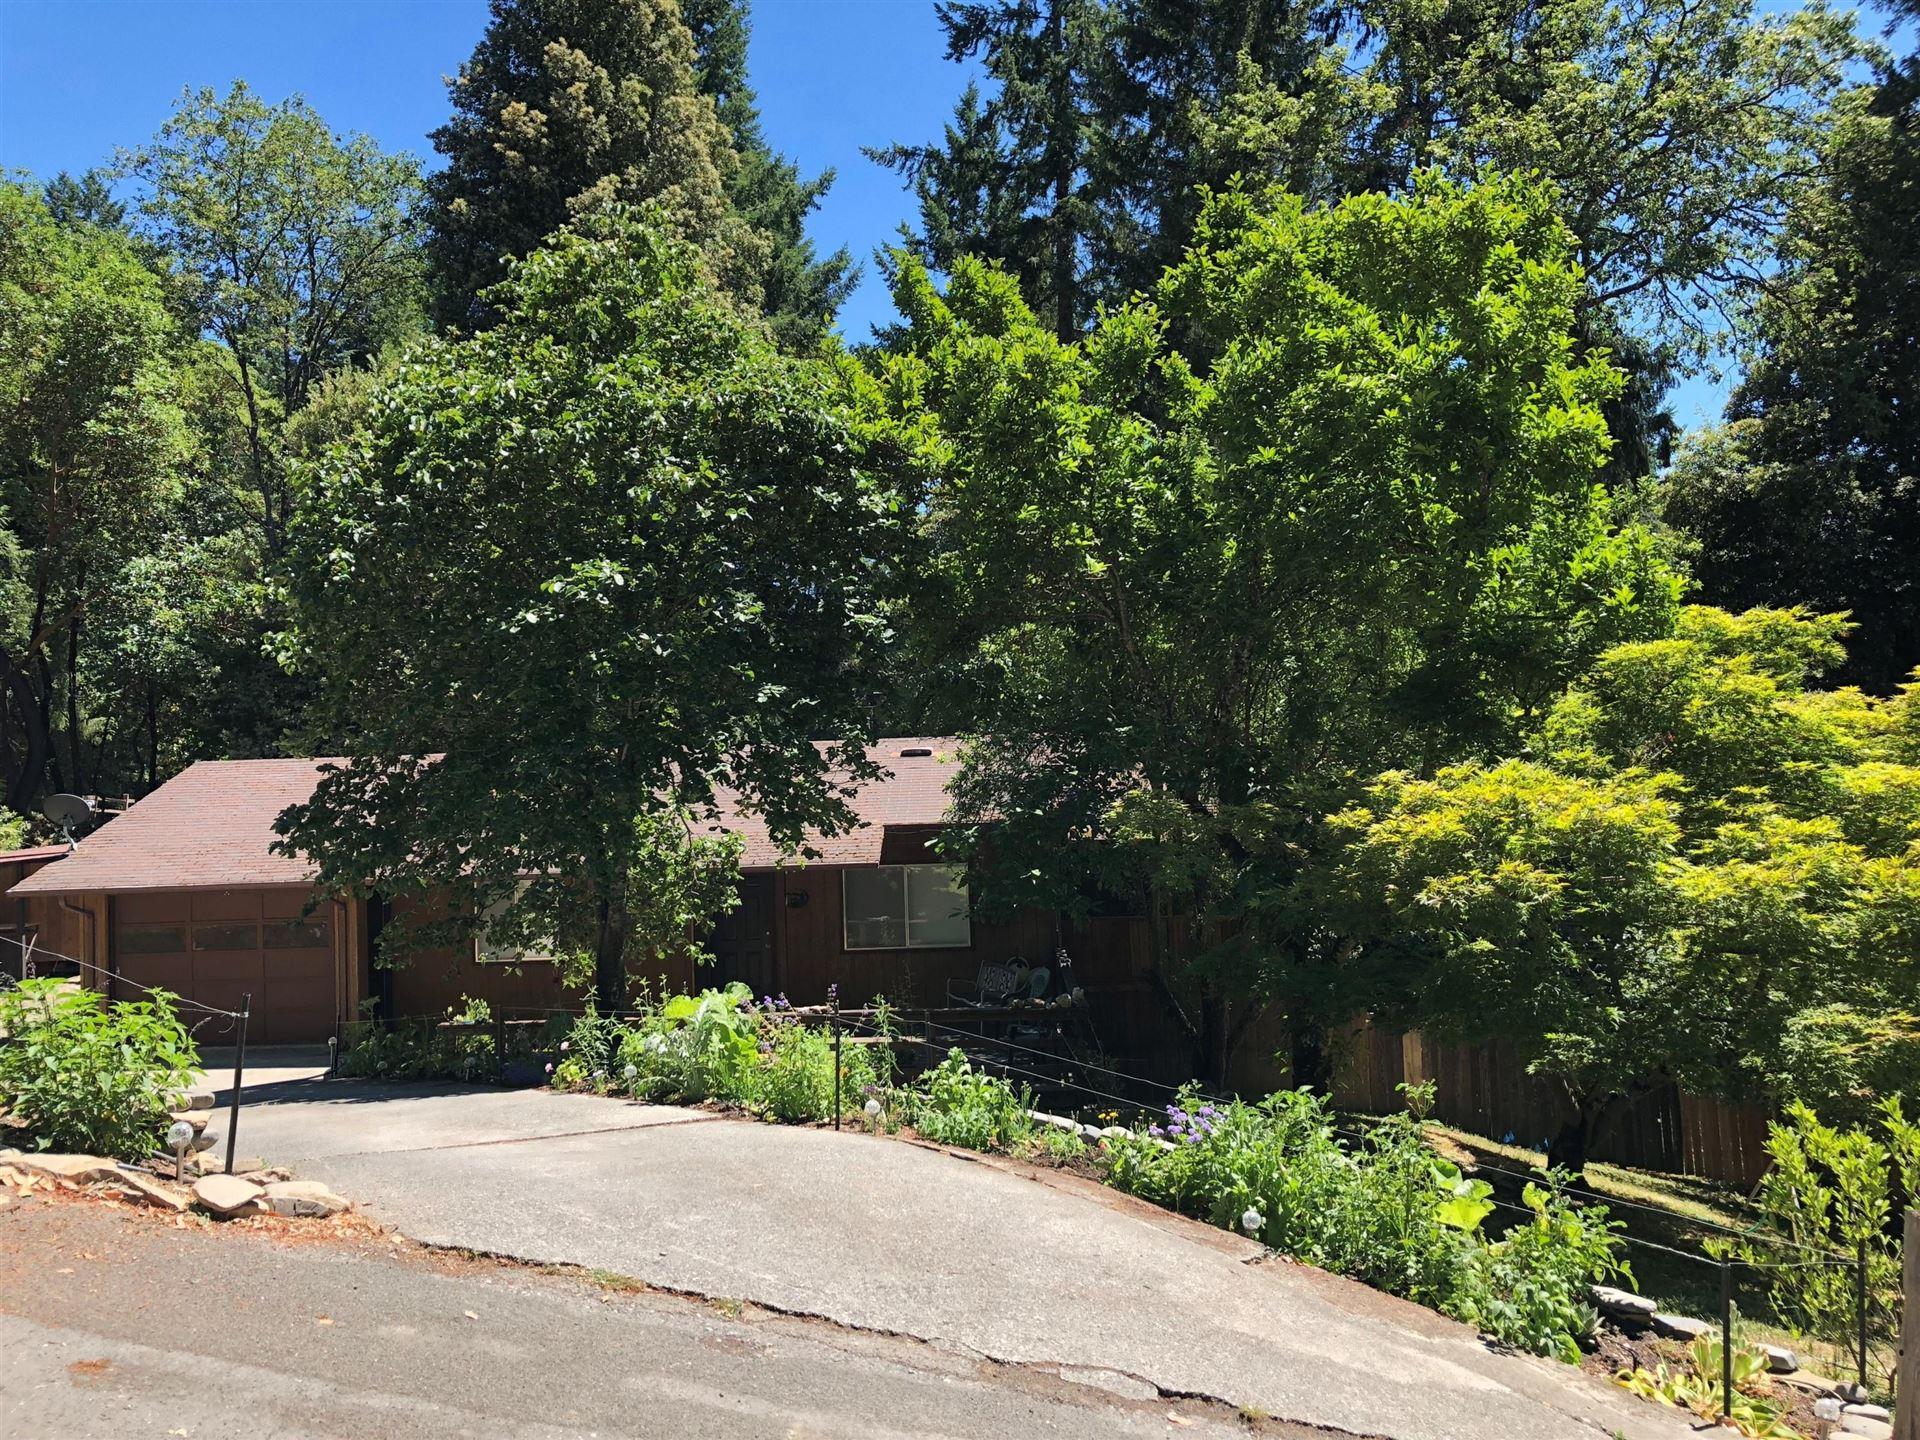 354 Hillcrest Way, Willow Creek, CA 95573 - MLS#: 255346